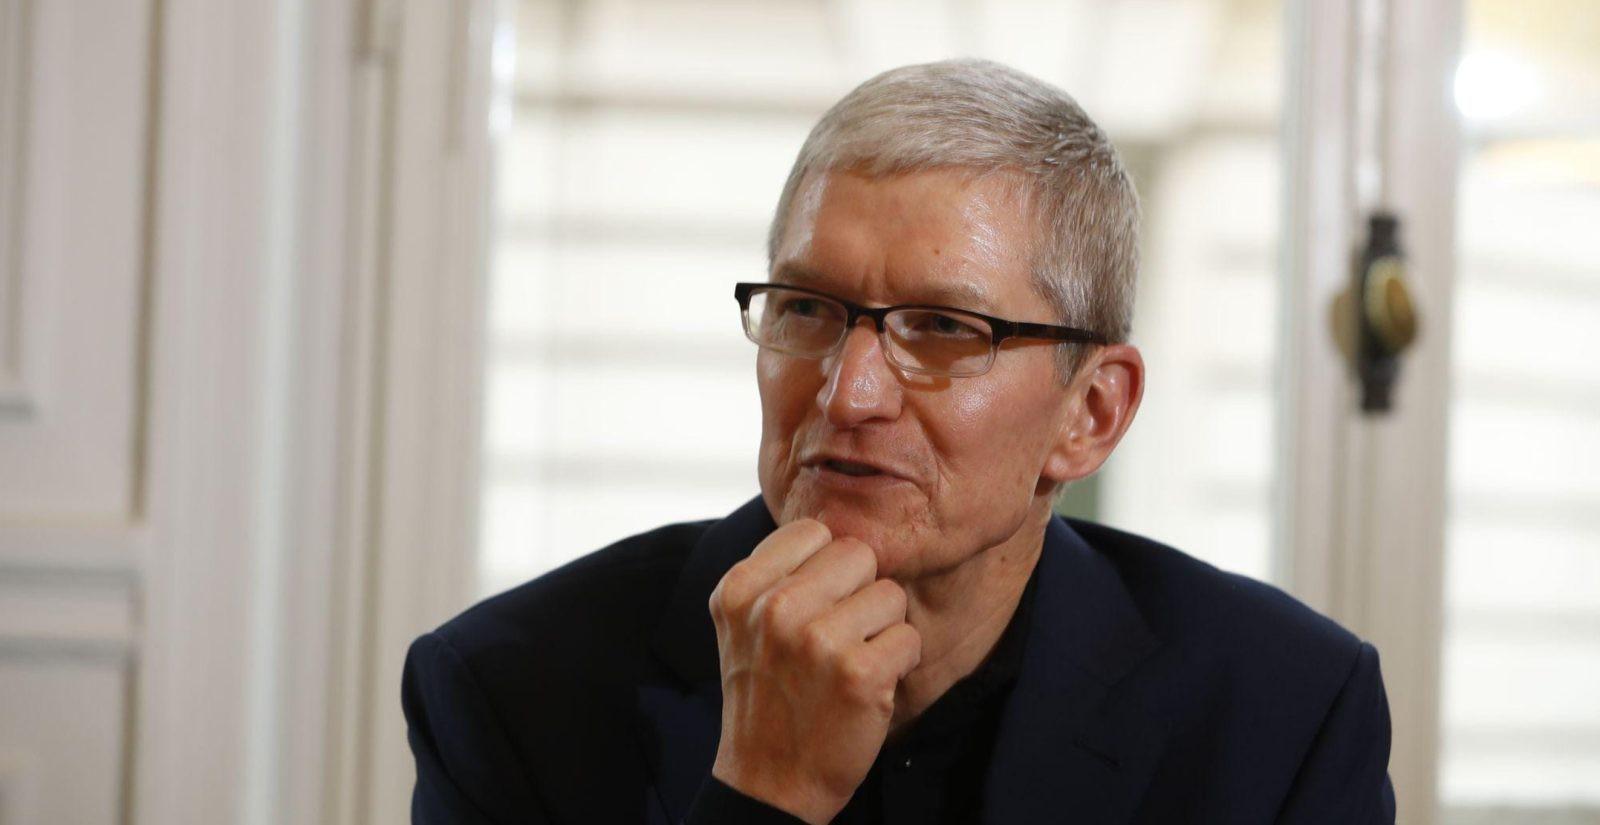 Mark Zuckerberg's employees were banned following the crashing of Apple.